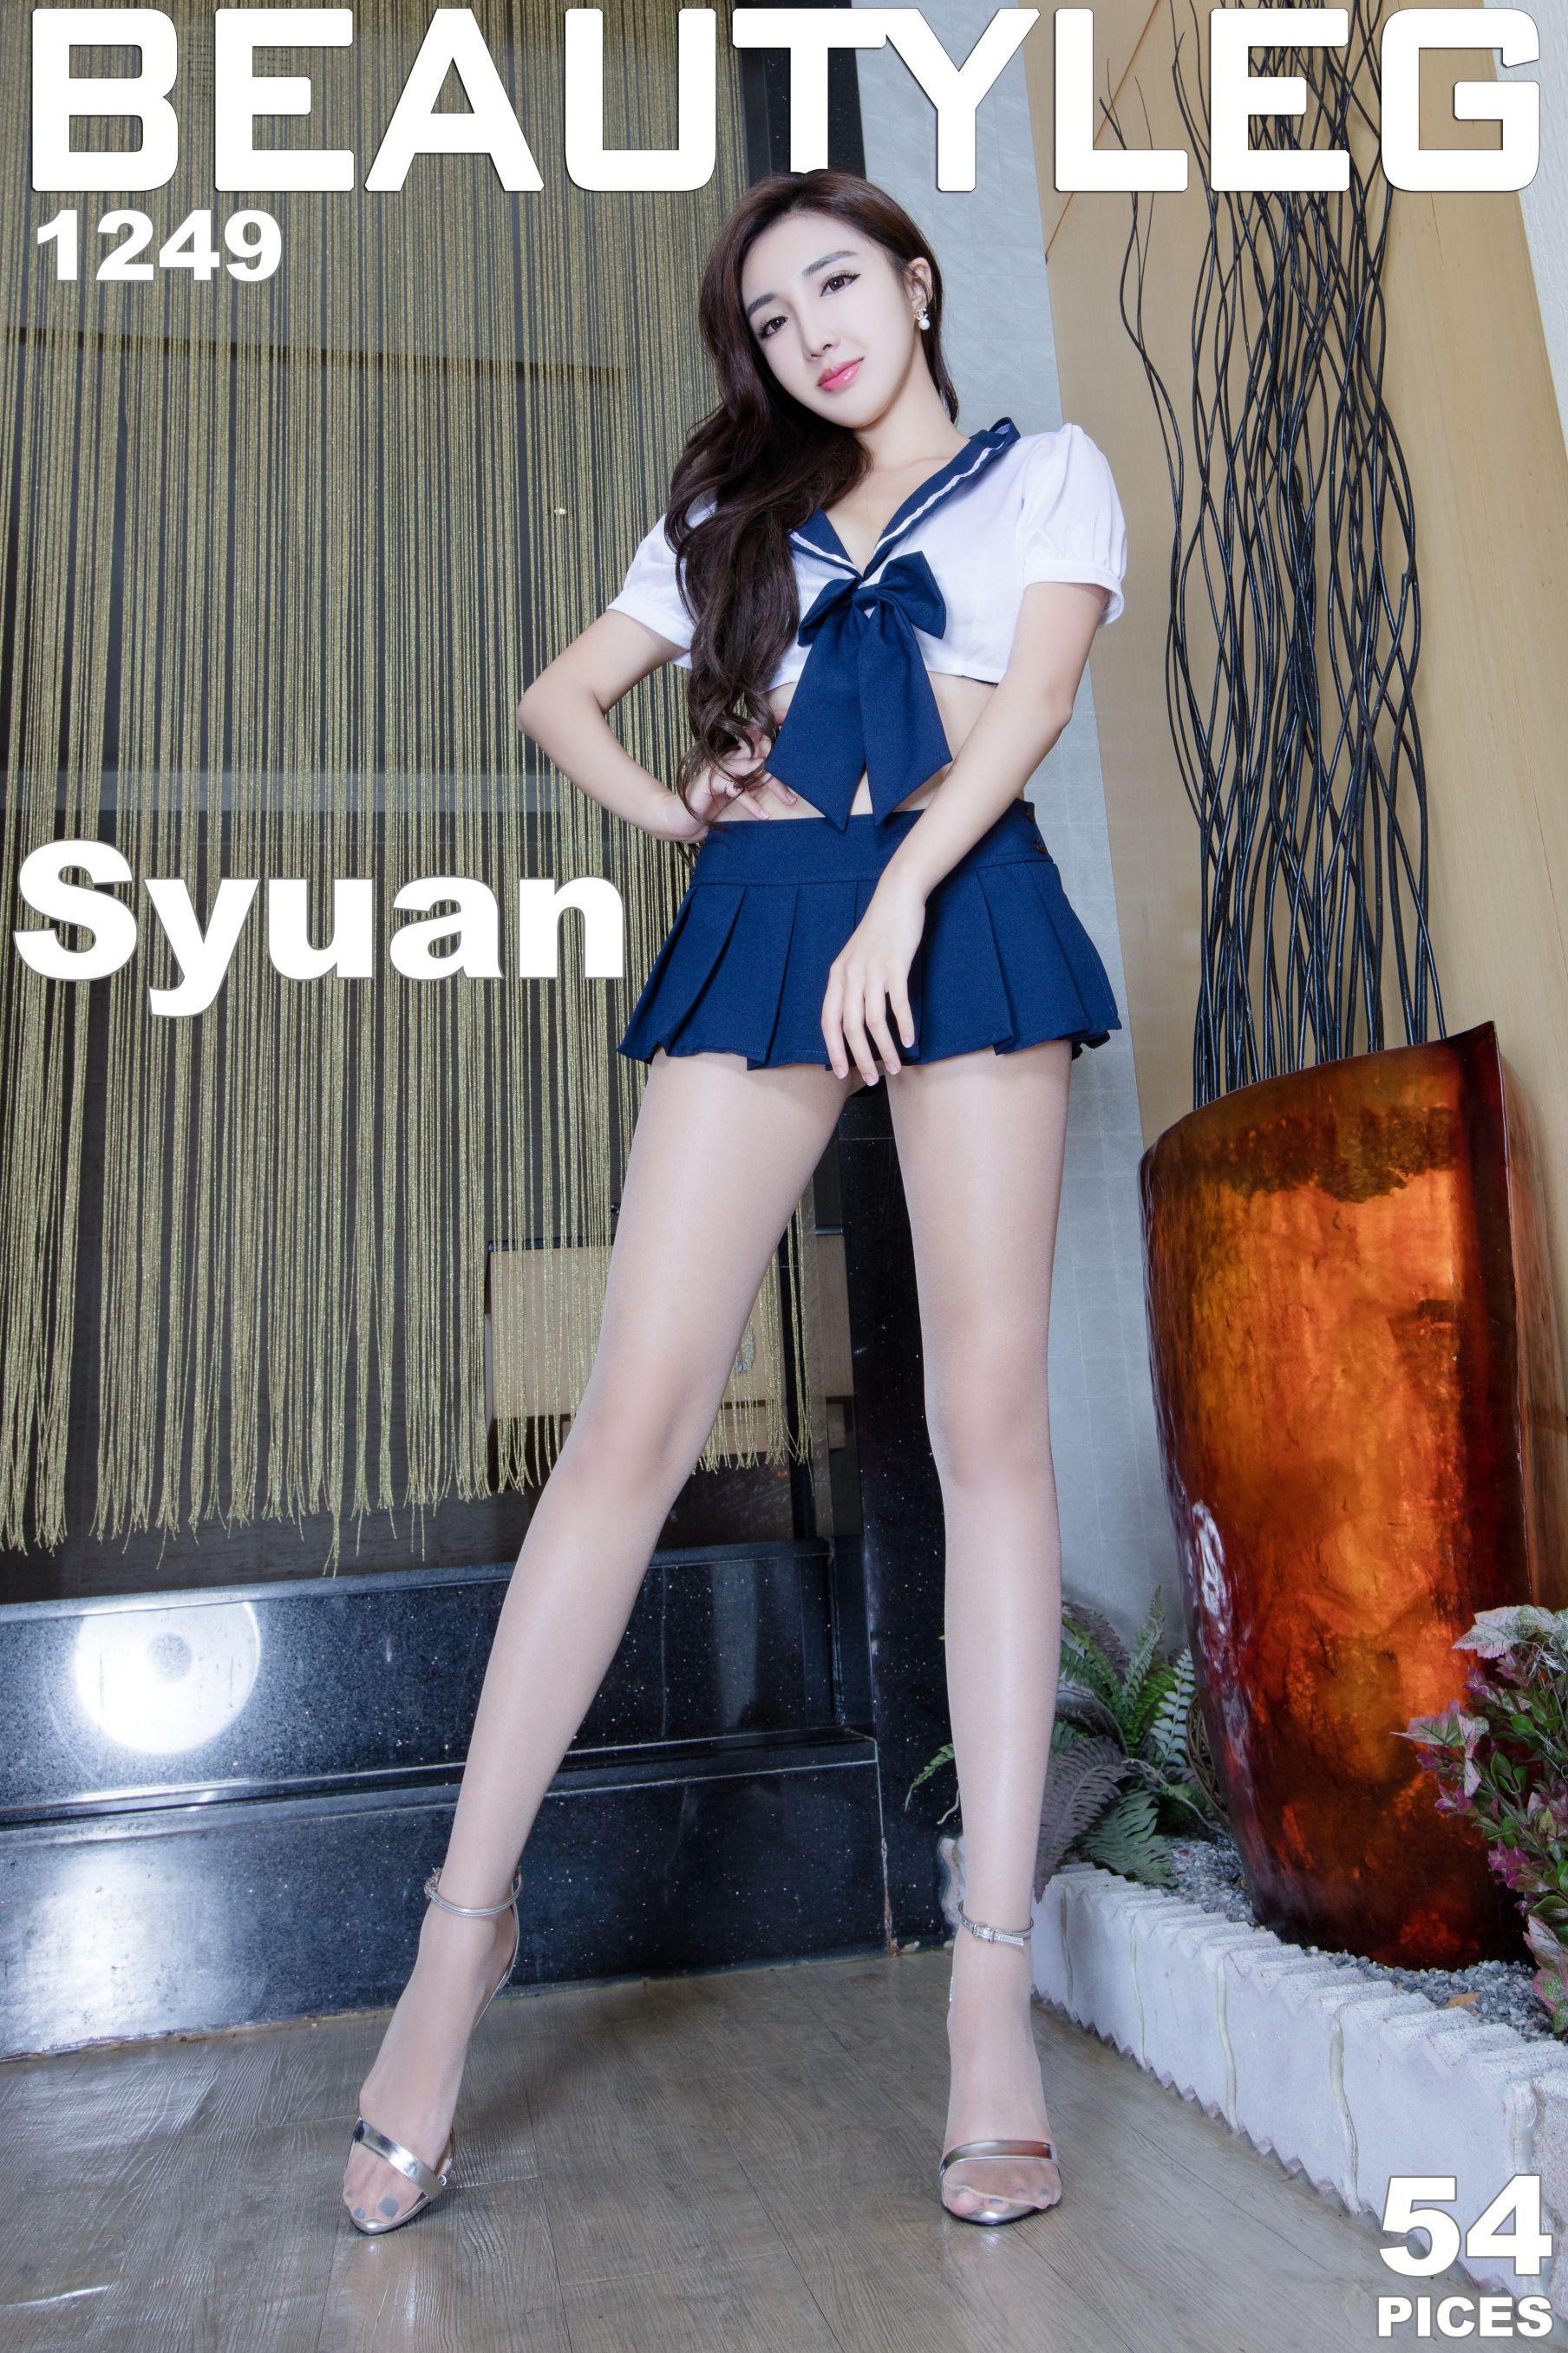 VOL.1763 [Beautyleg]长腿美女:赵芸(腿模Syuan,Syuan赵芸)超高清个人性感漂亮大图(49P)